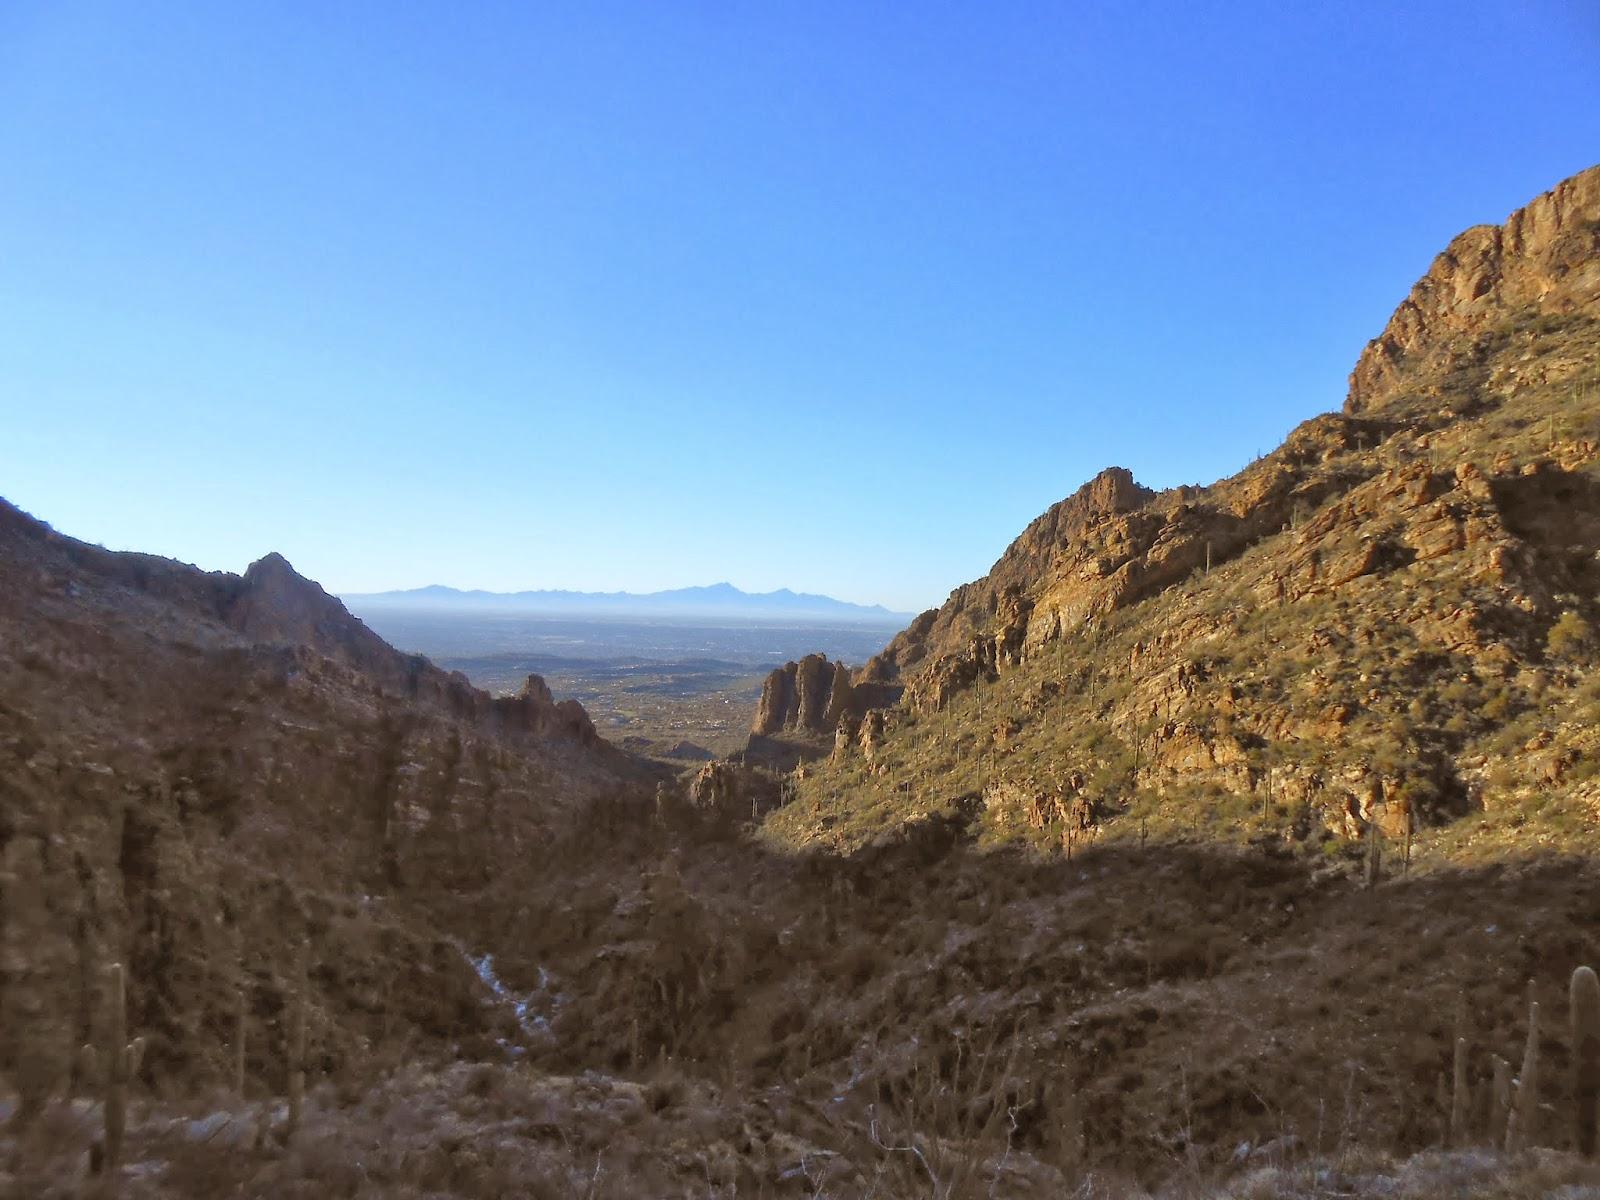 Window Rock: My first big peak hike!